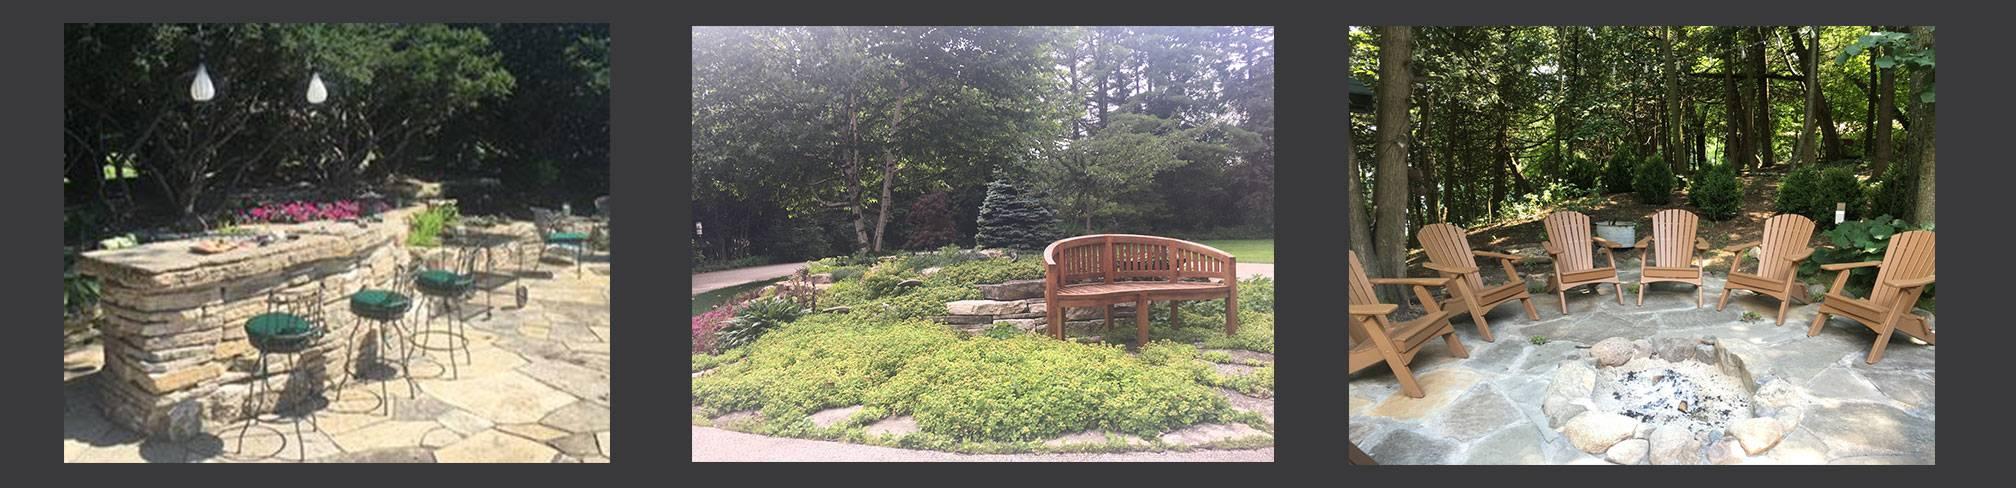 https://landmarklandscapes.pro/wp-content/uploads/2018/04/outdoor-enhancements.jpg